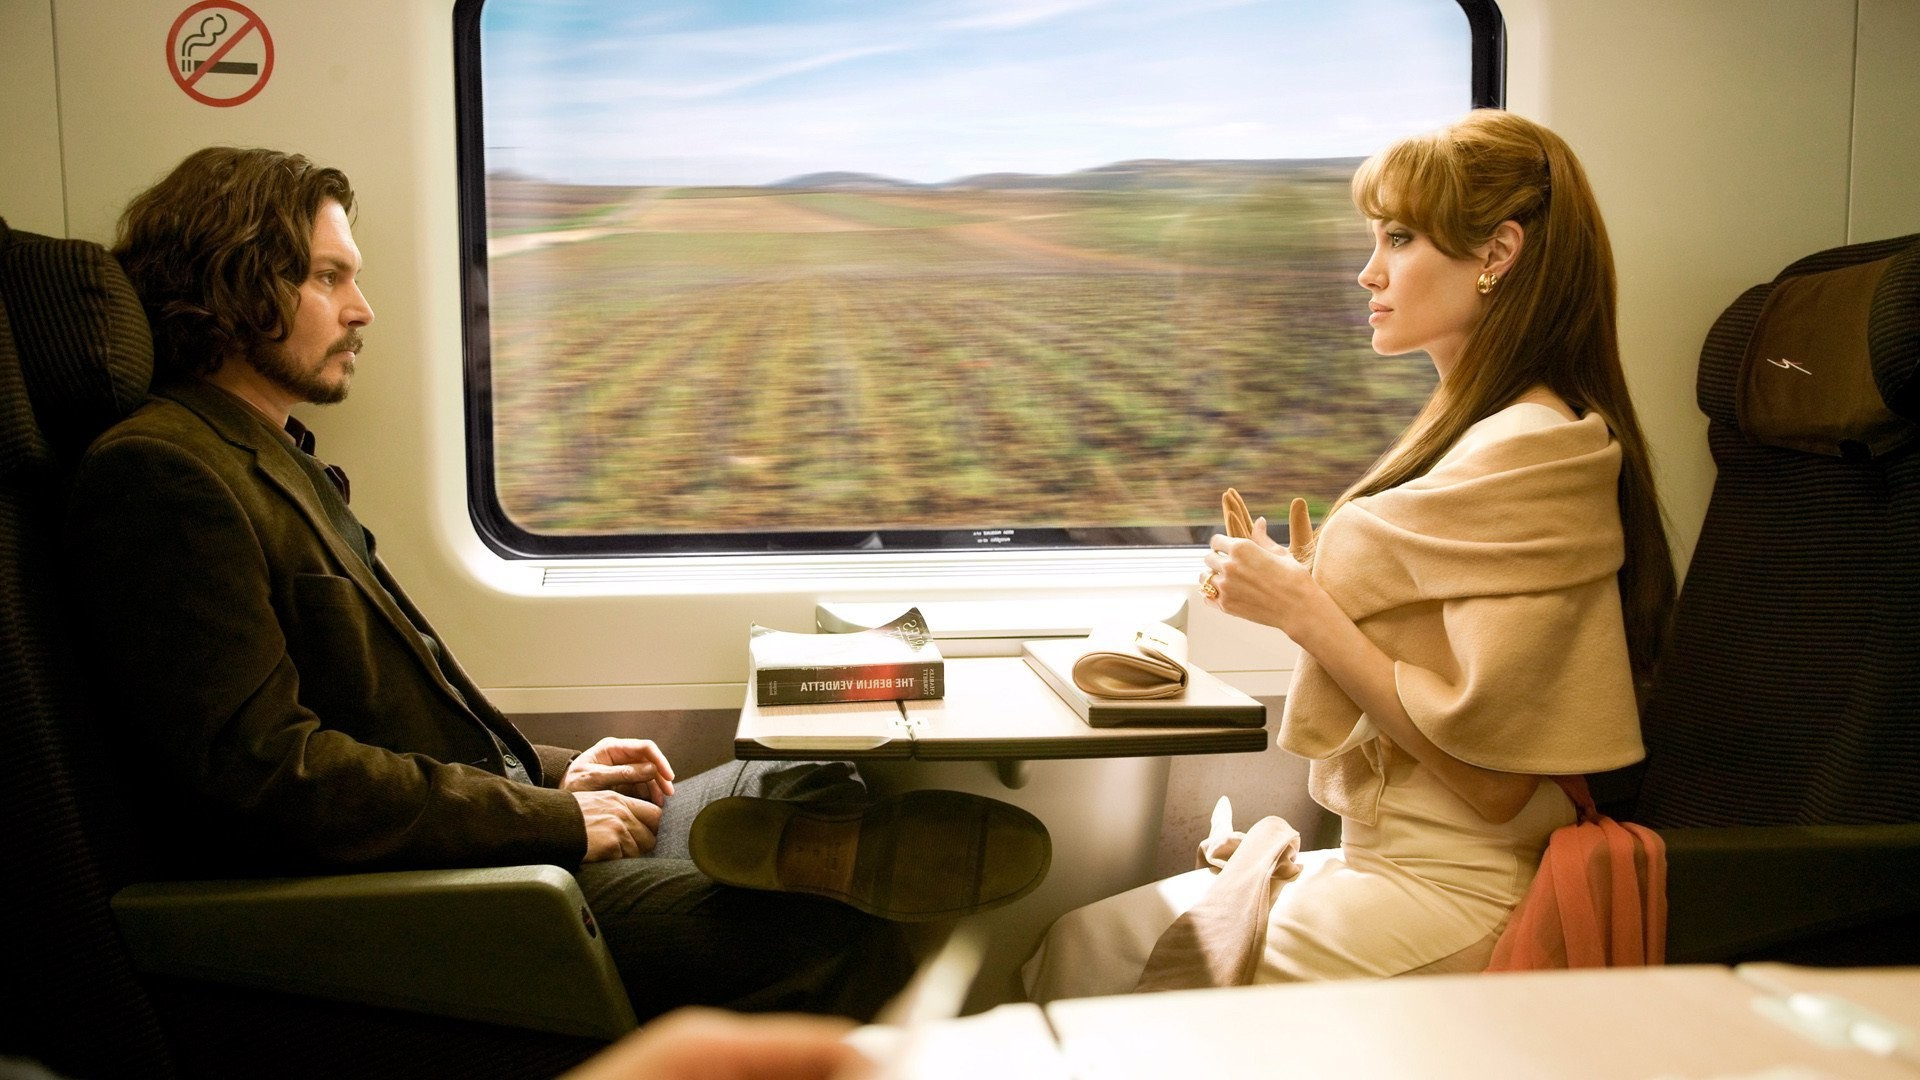 3d Wallpaper In Pakistan Women Actress Movies Train The Tourist Angelina Jolie